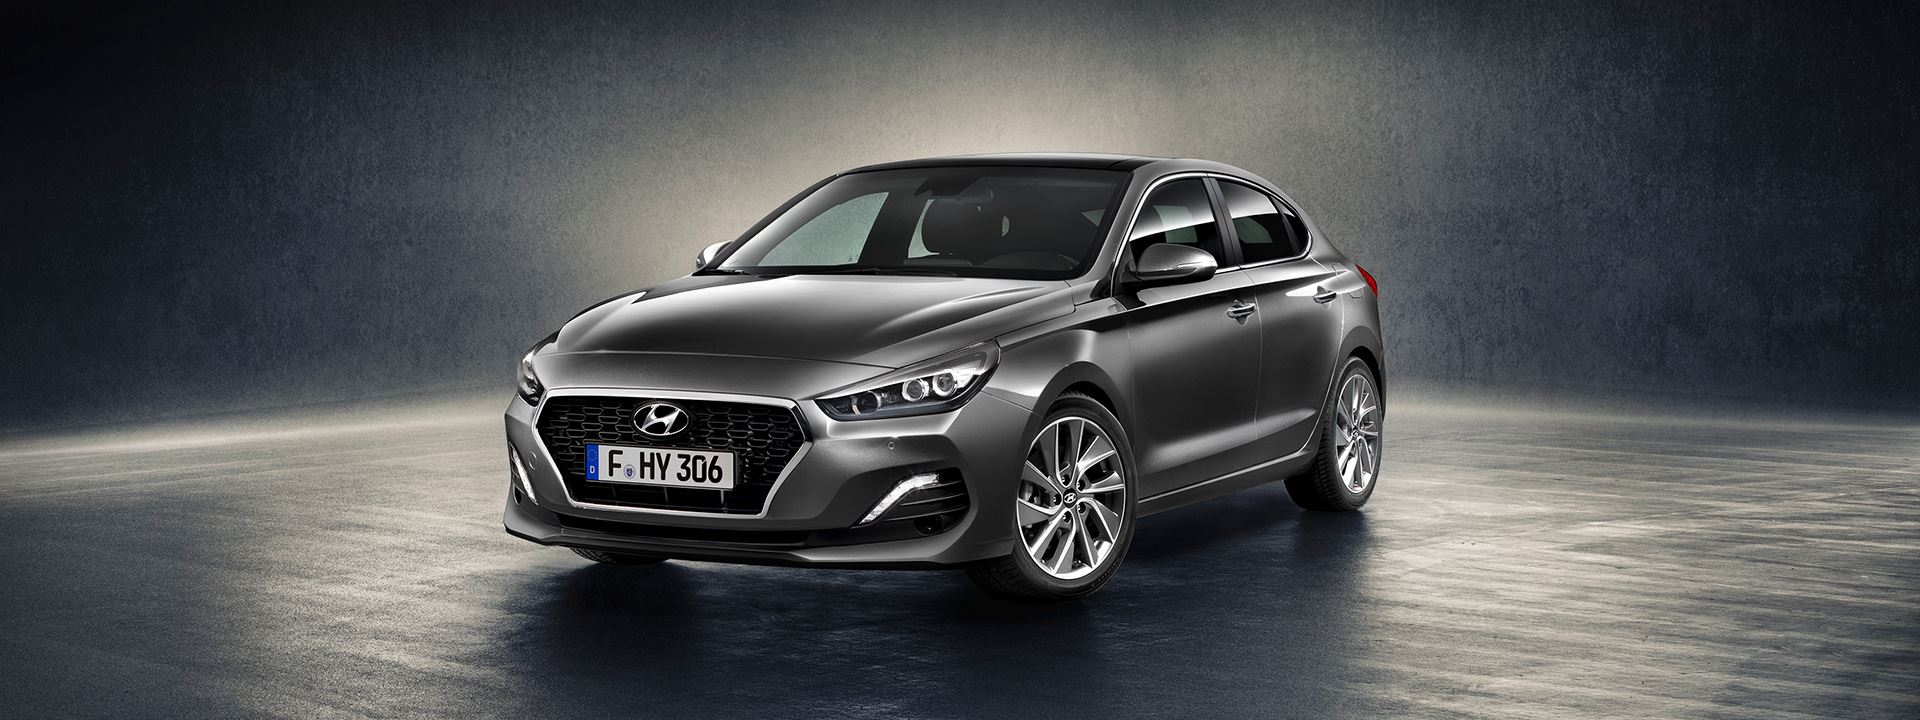 Flamboyant de nieuwe Hyundai i30 Fastback